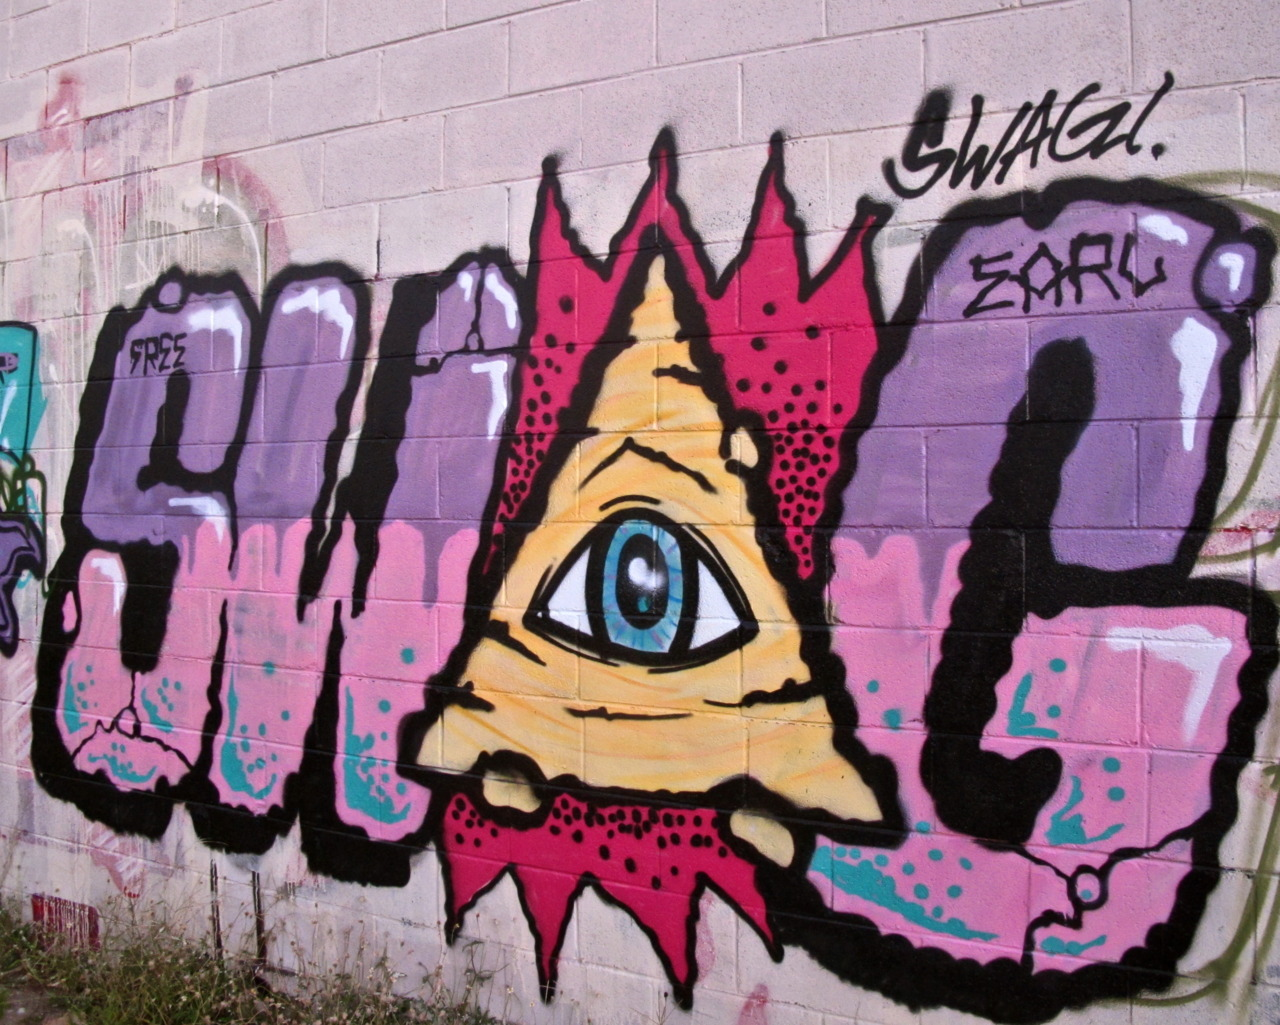 Drawn illuminati tumblr wallpaper Swag HD Google Widescreen Photography